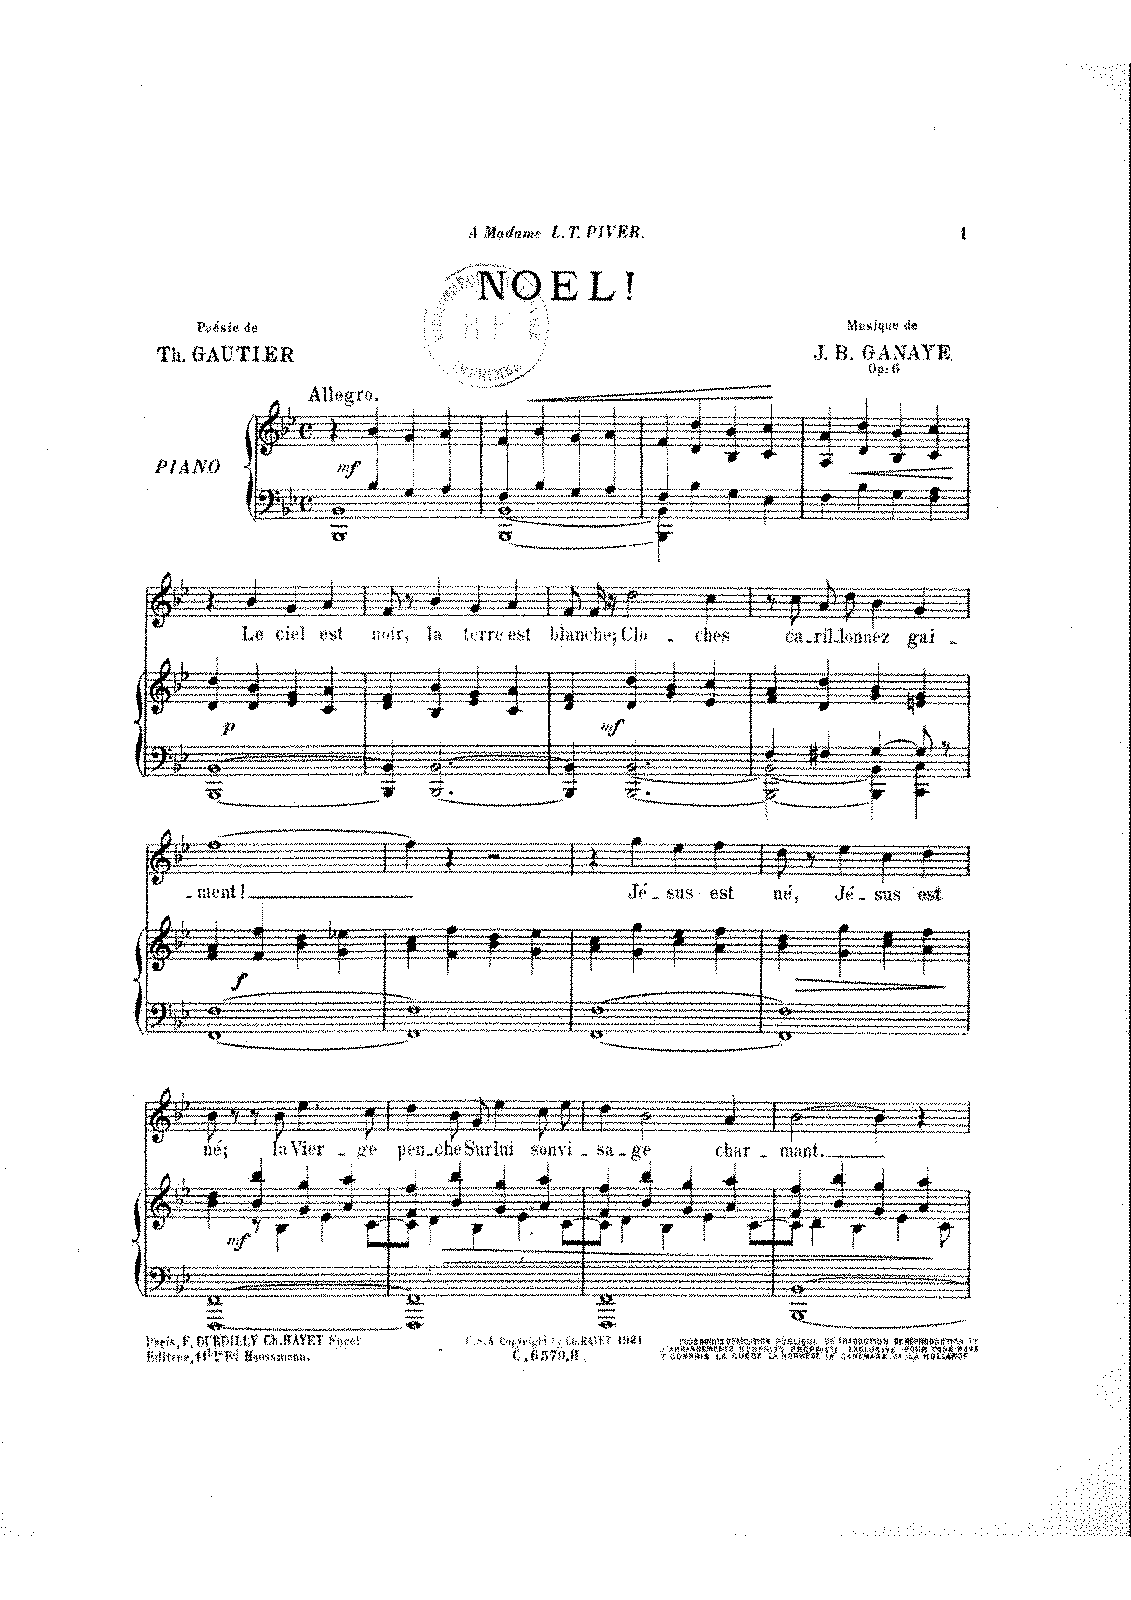 Noël!, Op 6 (Ganaye, Jean-Baptiste) - IMSLP/Petrucci Music